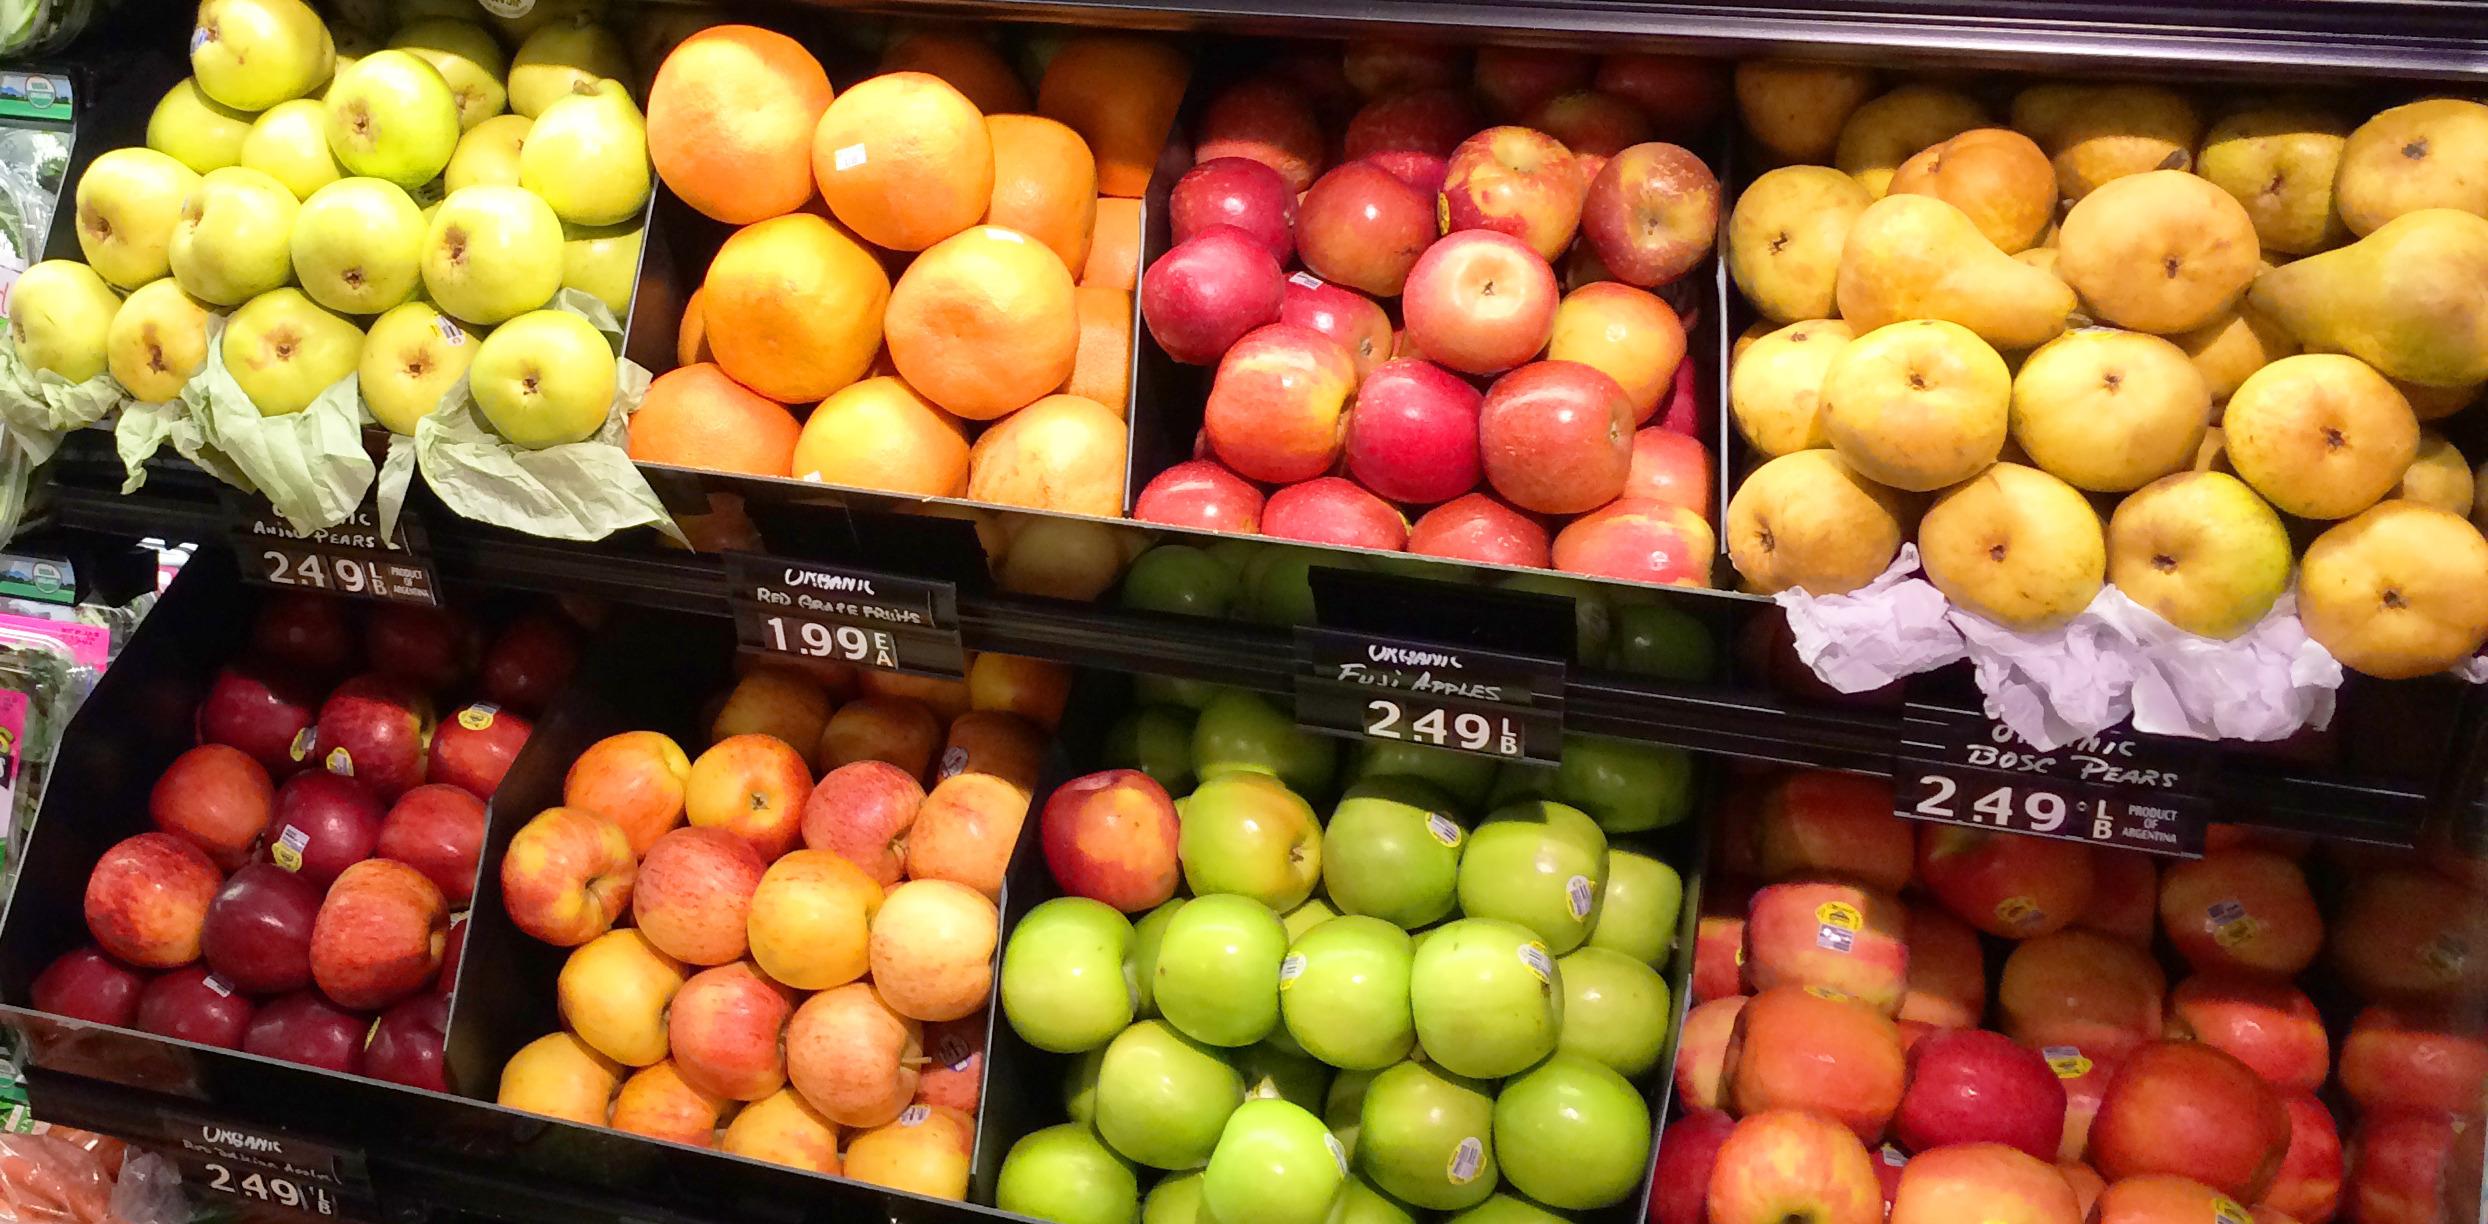 0c72dee31def7b854e08_best_b0be6f8923b2d0da2925_10_Our_fruit_selection_is_inspected_constantly_for_freshness.jpg